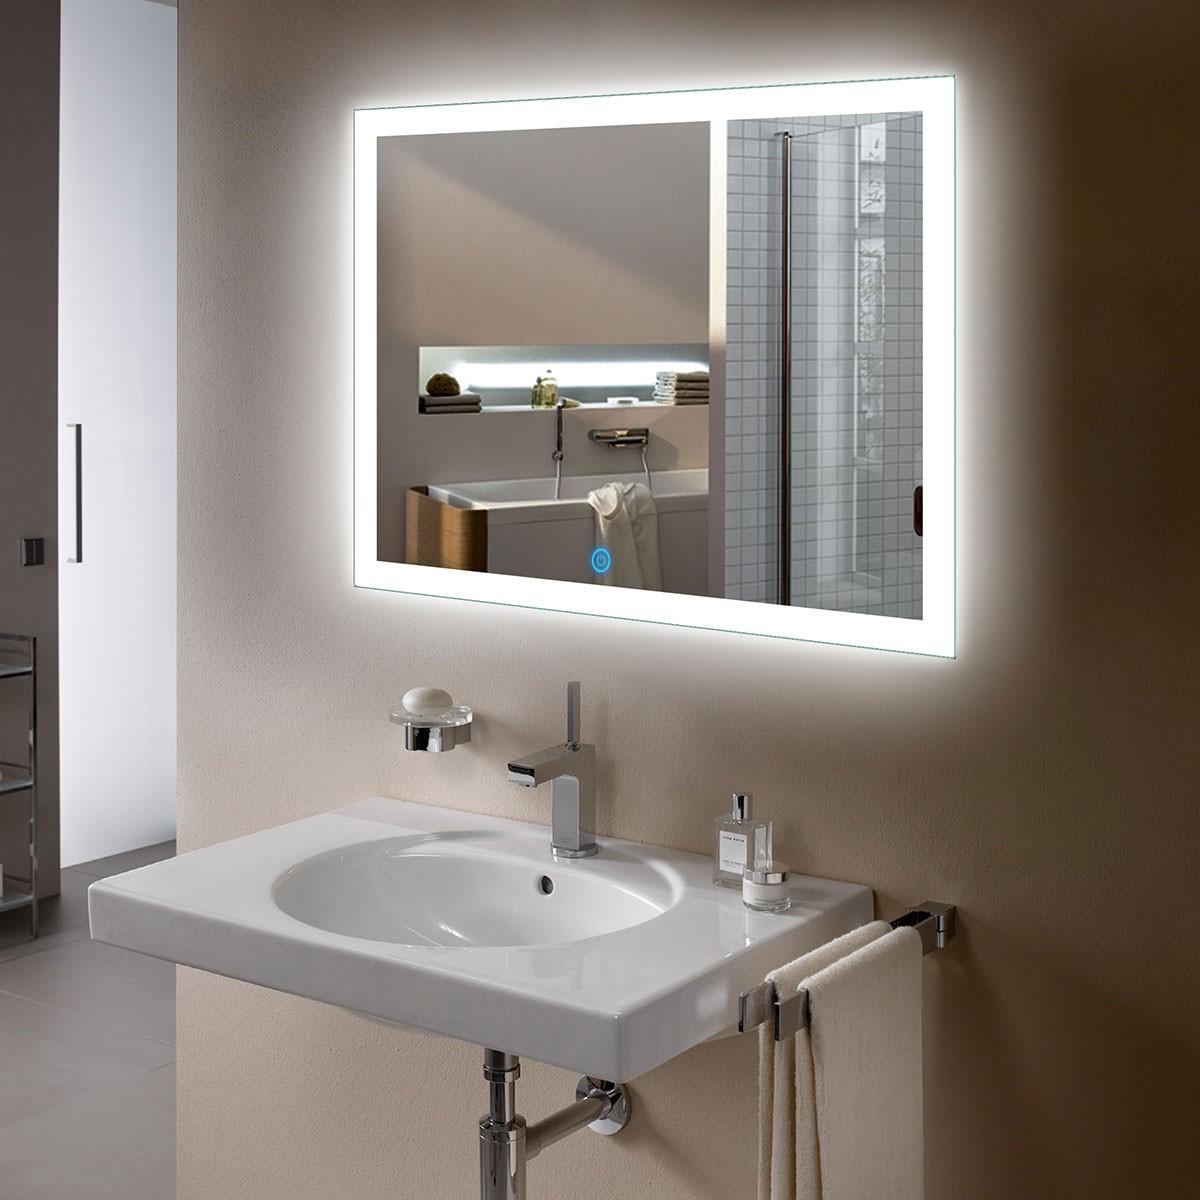 36 x 28 In Horizontal LED Bathroom Mirror, Touch Button (DK-OD-N031-I)